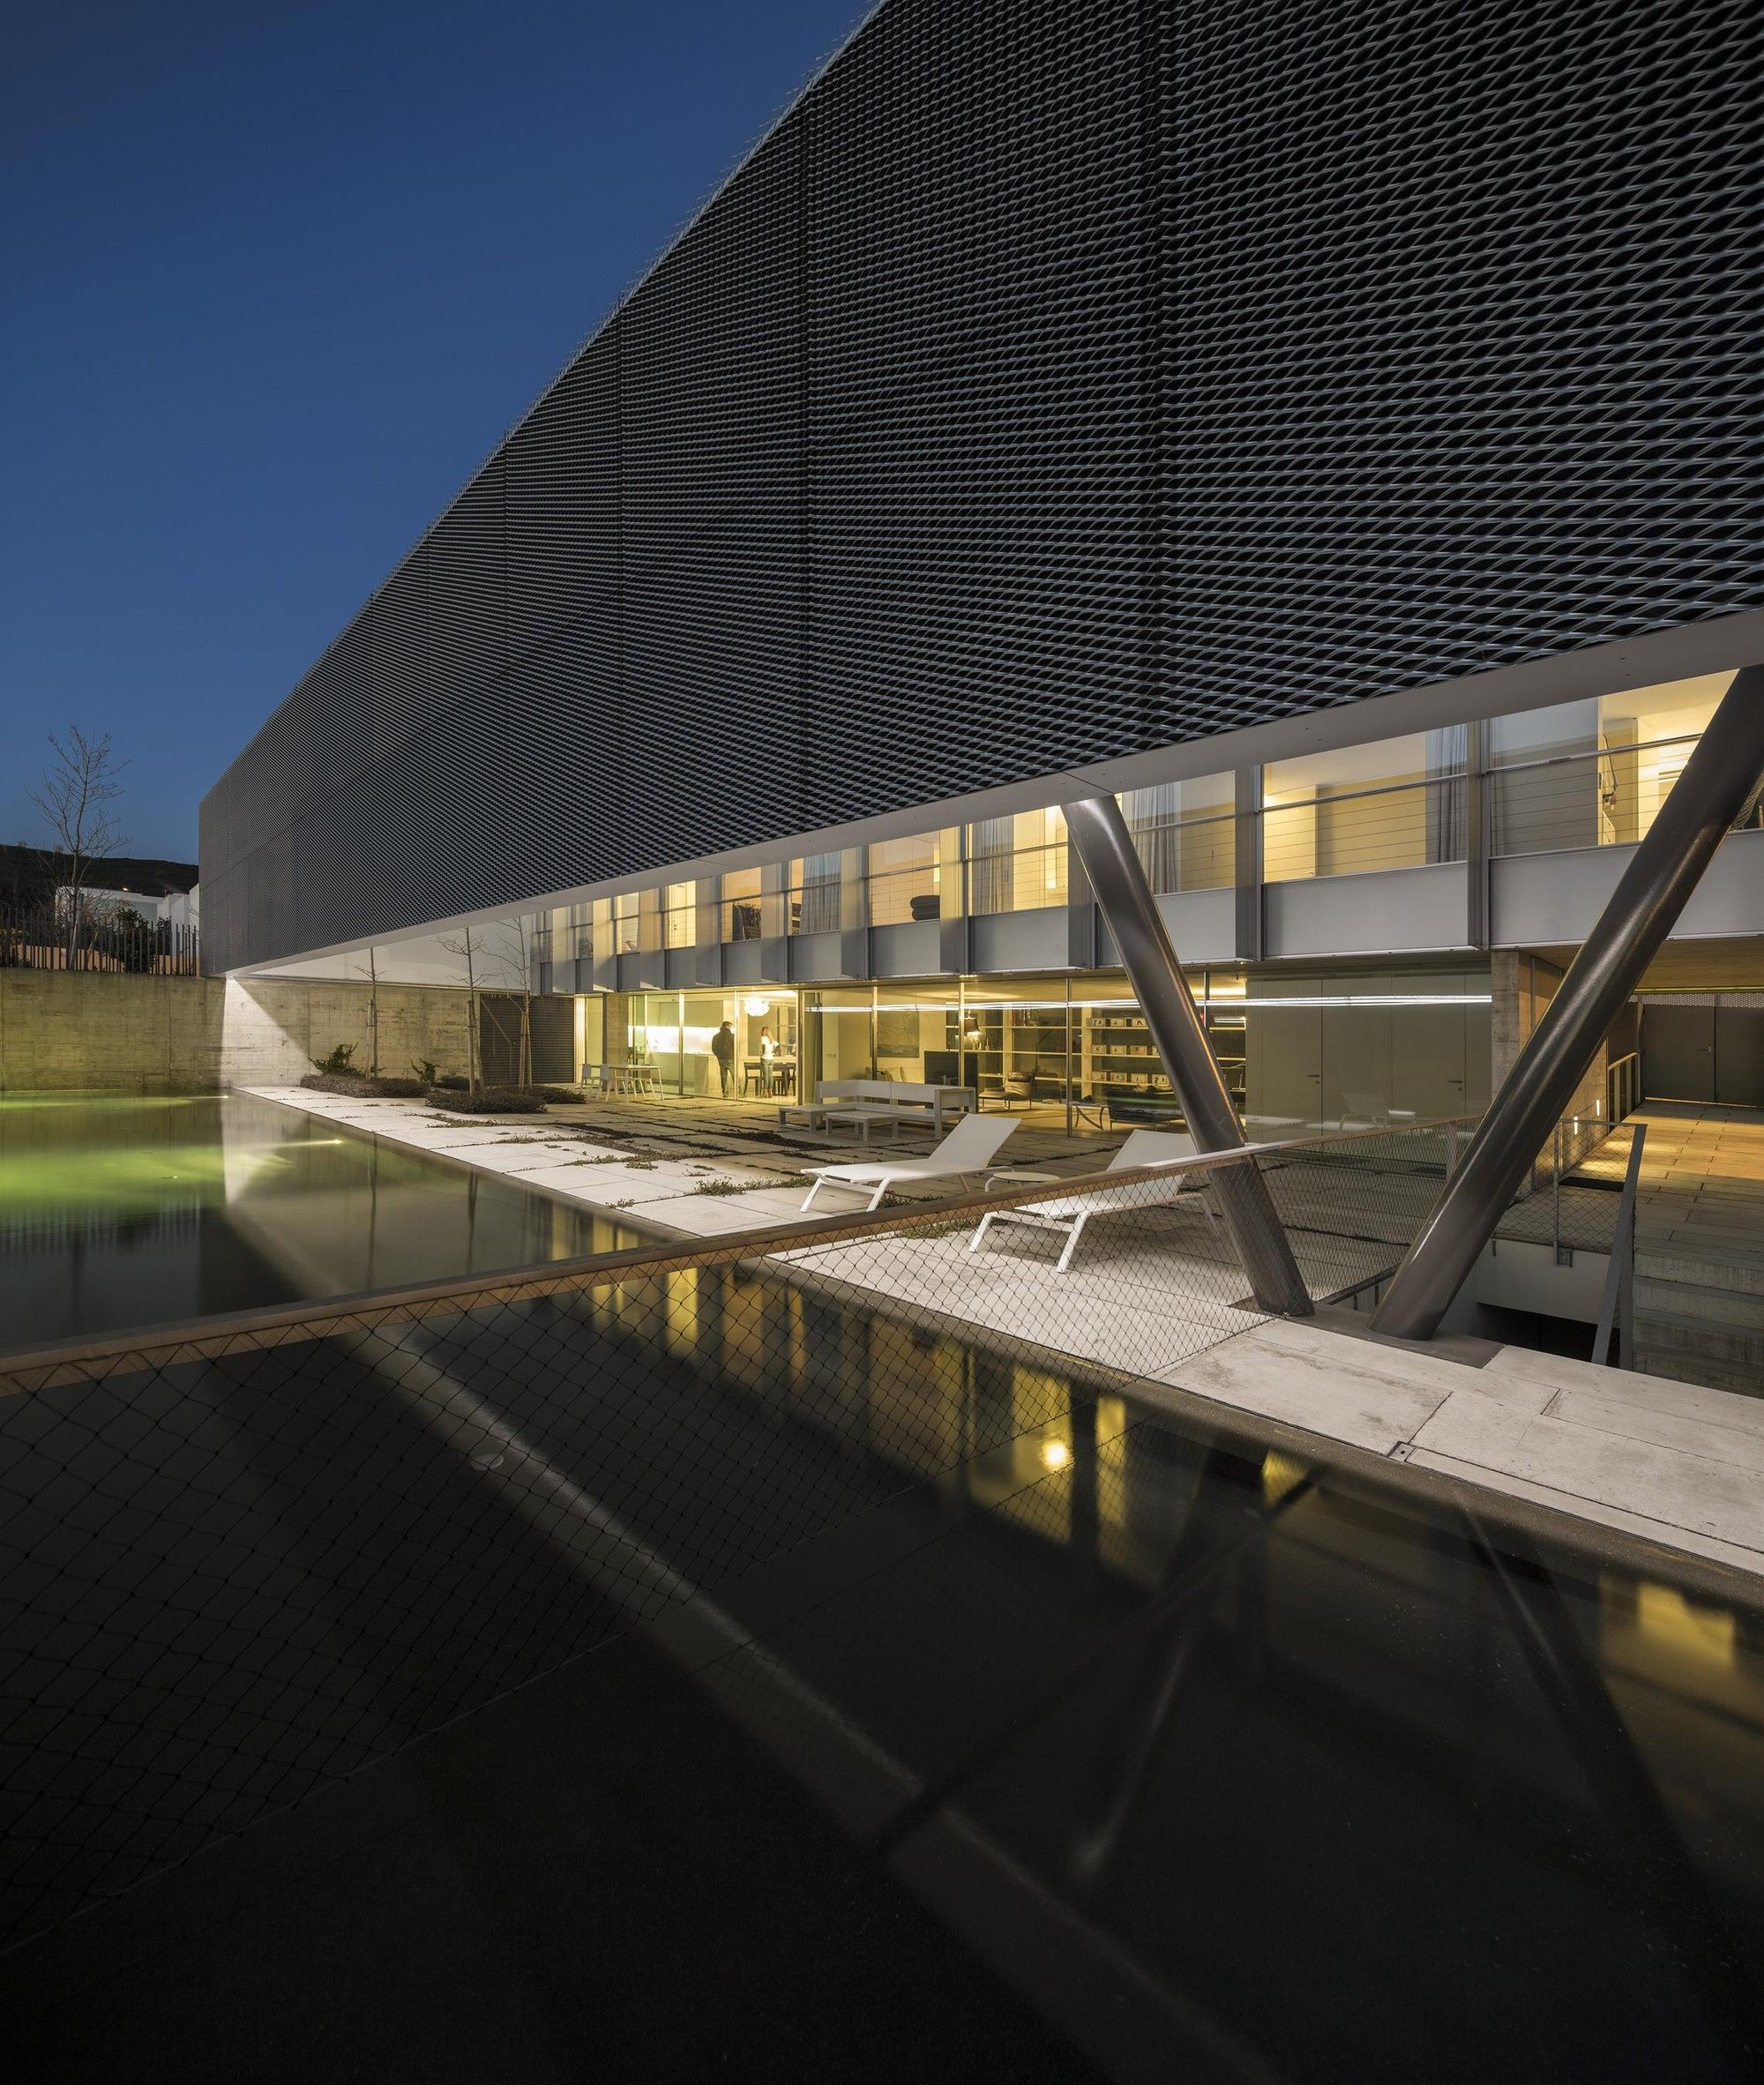 Utopia Villa / Gonçalo Byrne Arquitectos - Portugal